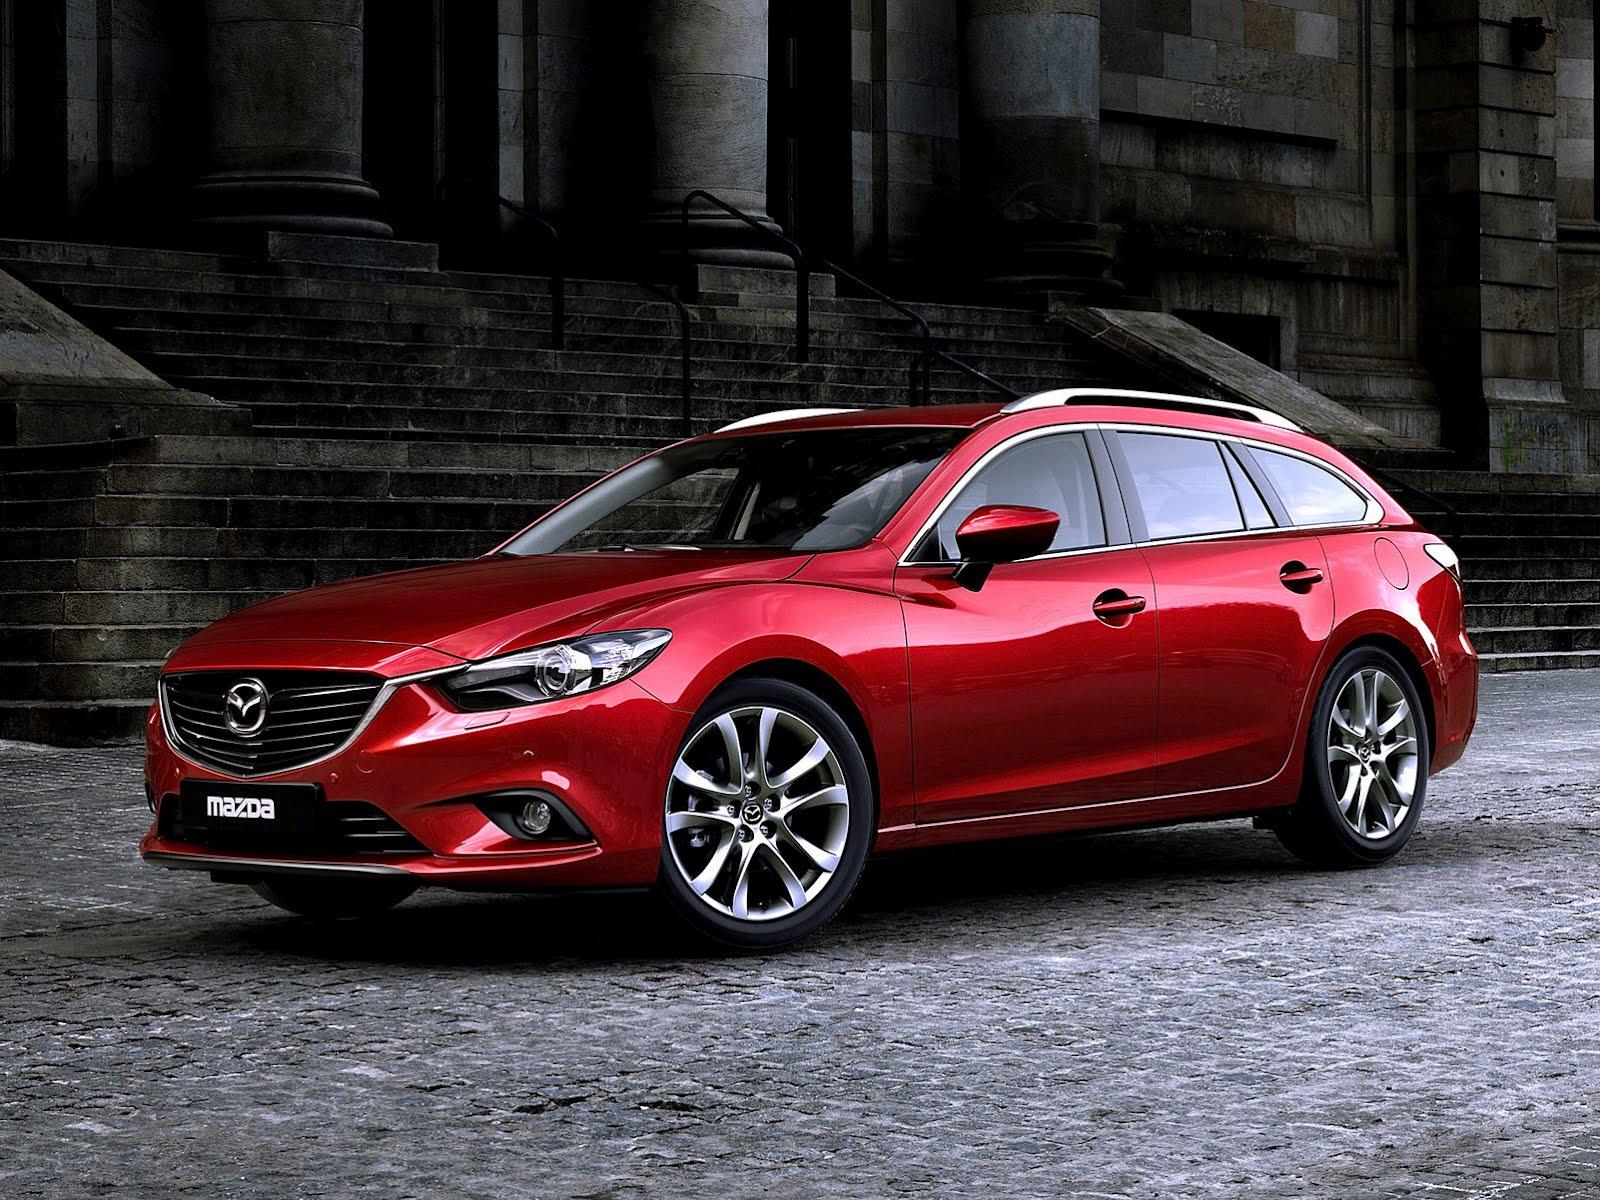 http://automobilio.info/auto/Mazda-6-III-Facelift-Estate.jpg